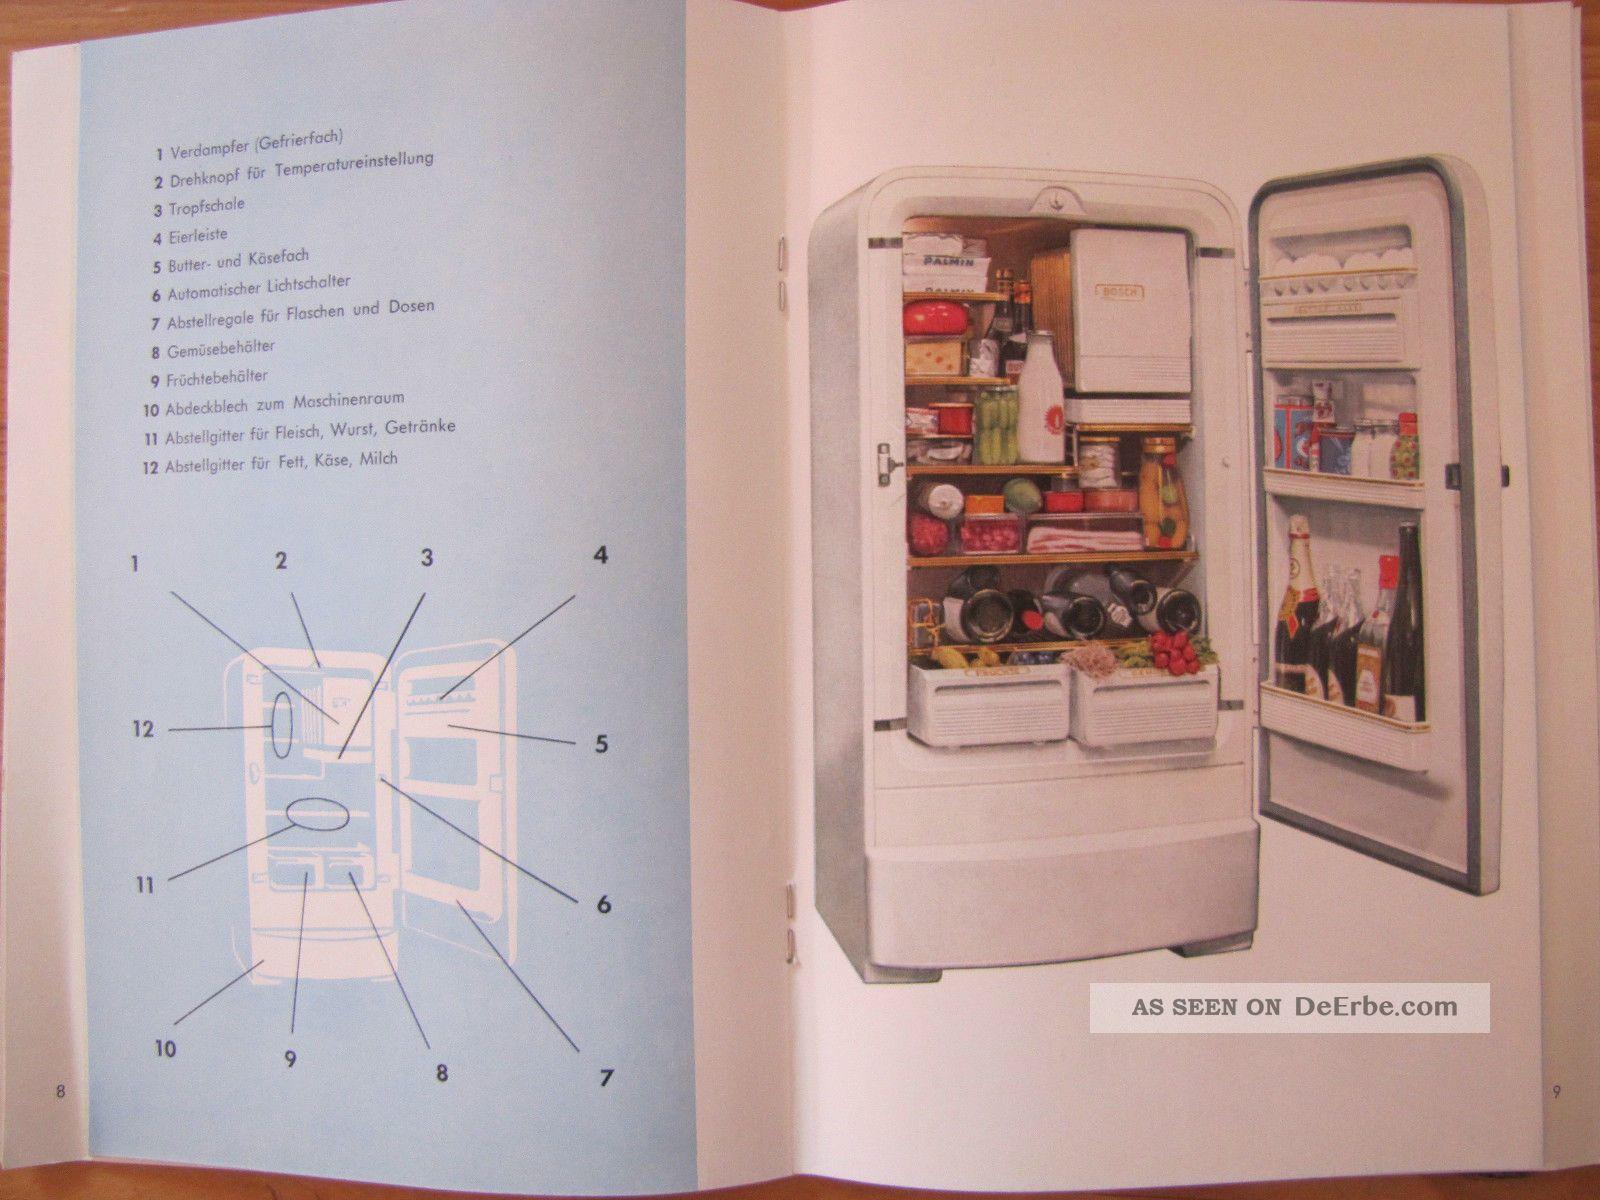 Alter Bosch Kühlschrank 60er Jahre : Alte er er jahre bosch bedienungsanleitung anleitung kühlschrank